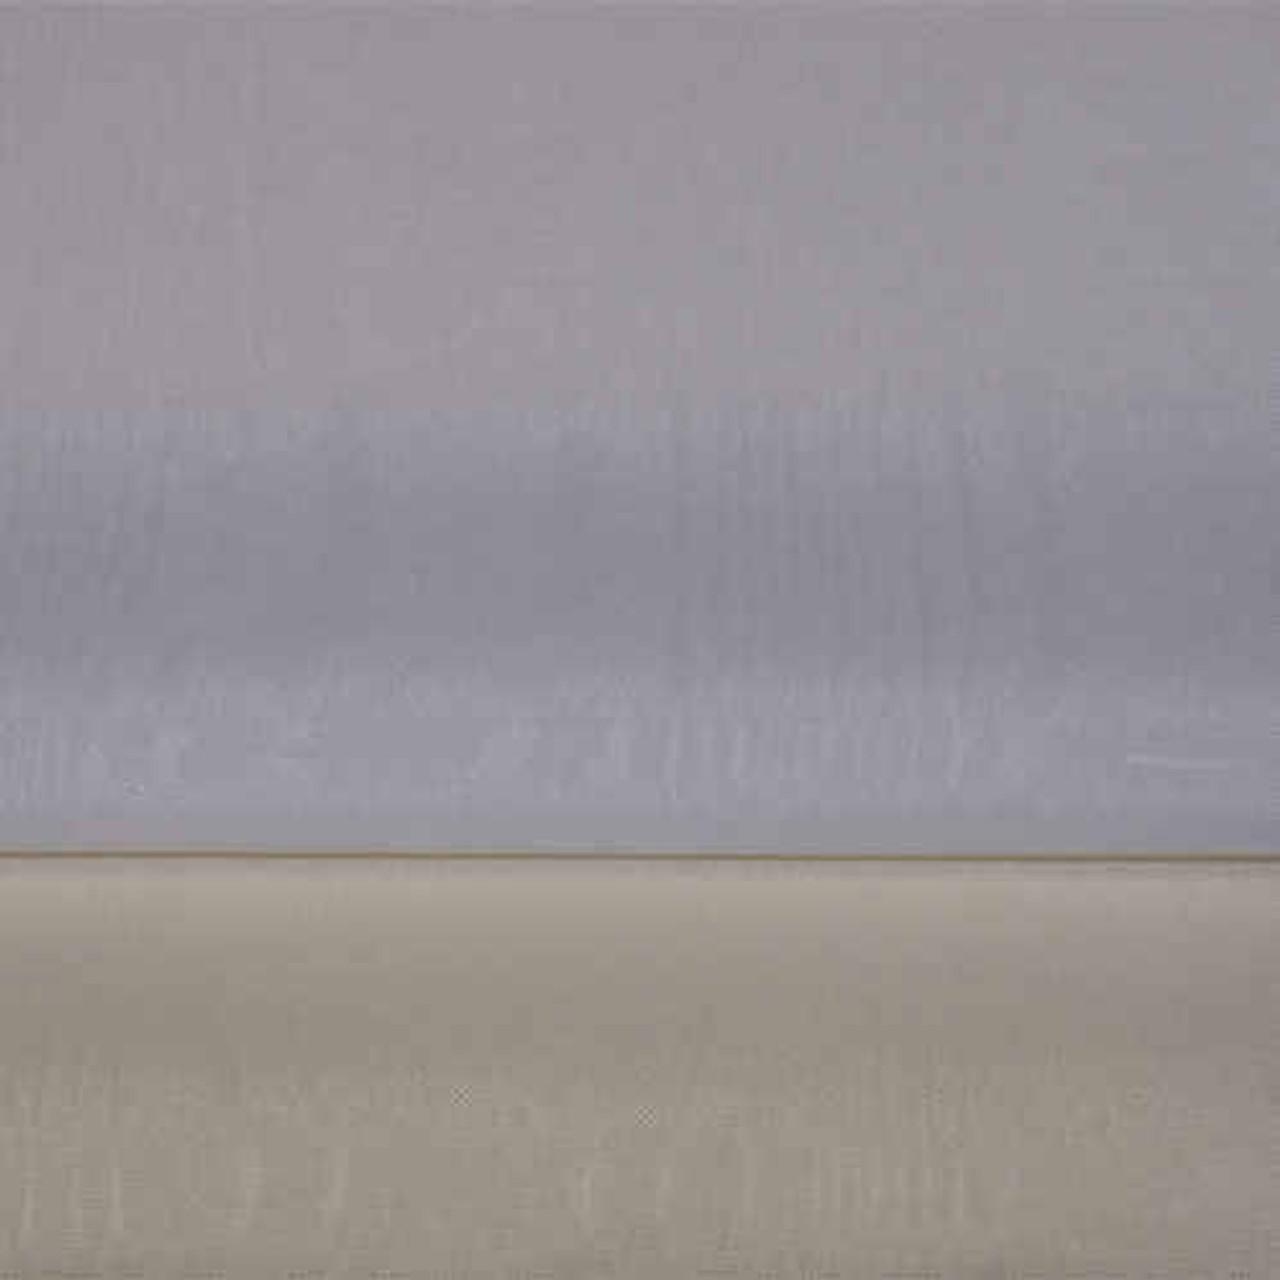 Kartri KARTRIor MOIRE EZY-HANGor POLYESTER SHOWER CURTAIN 72X74 WHITE OR BEIGE PACK OF 12